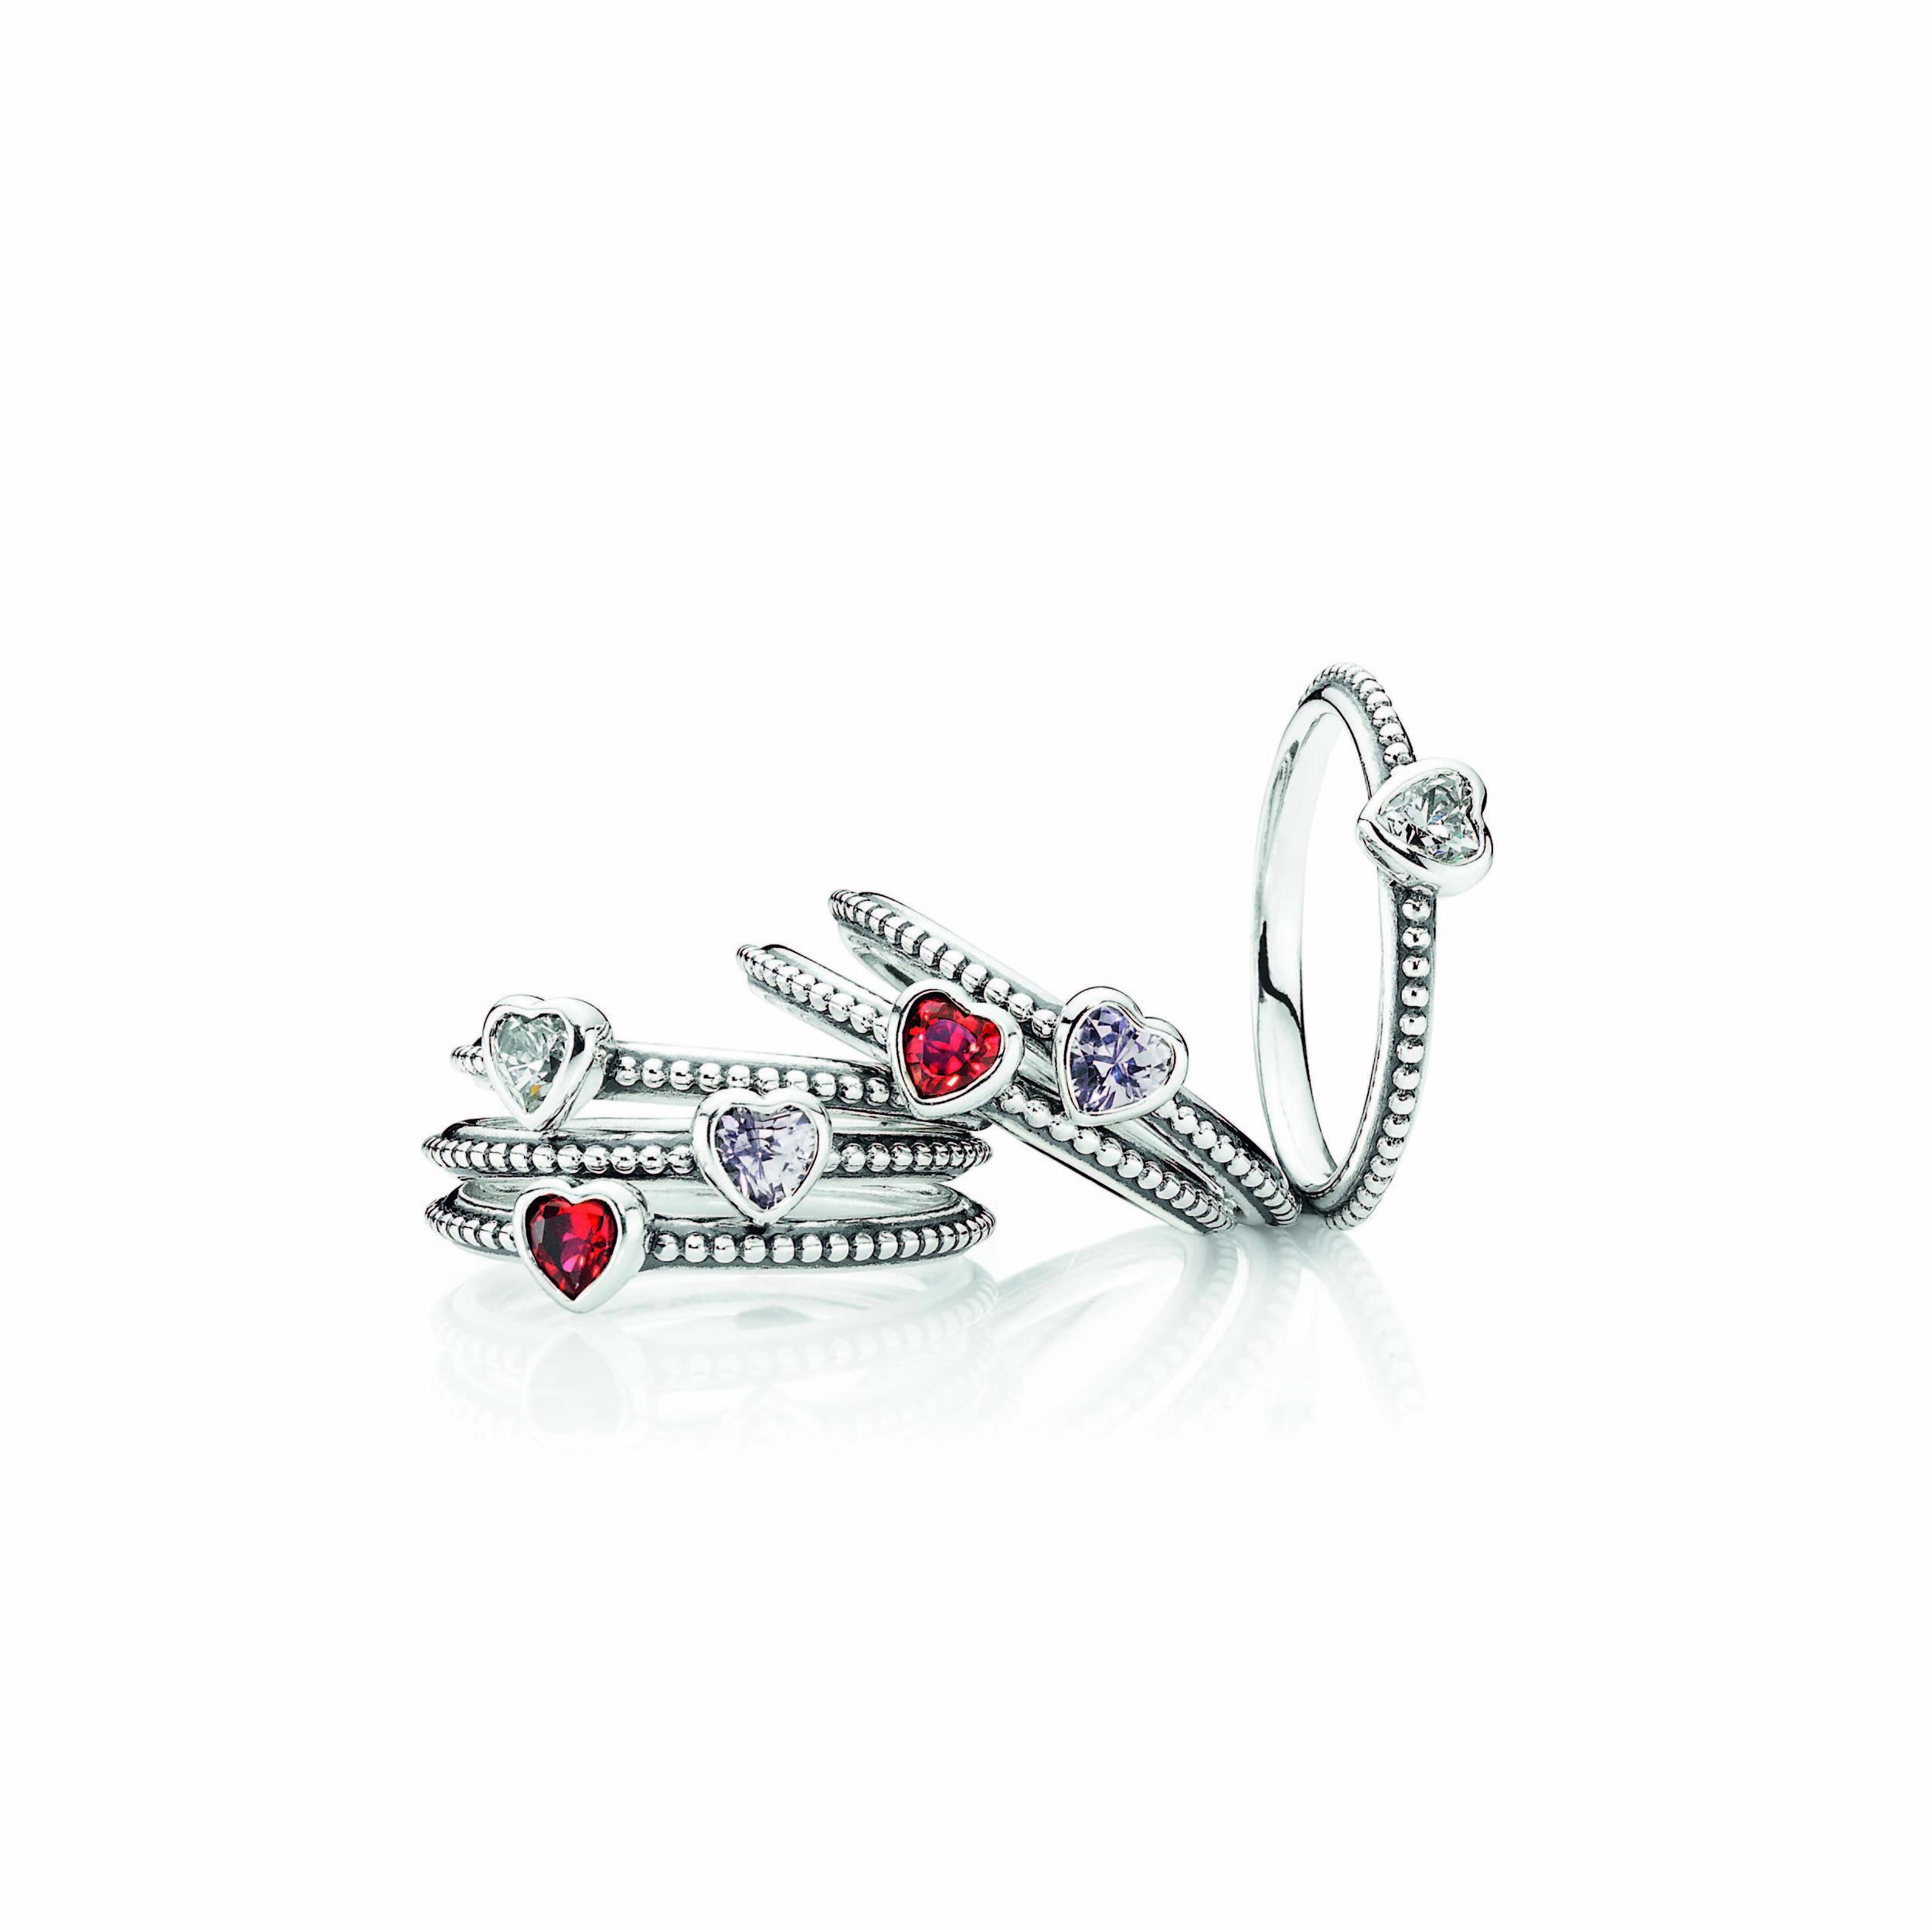 PANDORA_Valentine's 2014_Silver Heart Stackable Rings_HK$399 Each.jpg